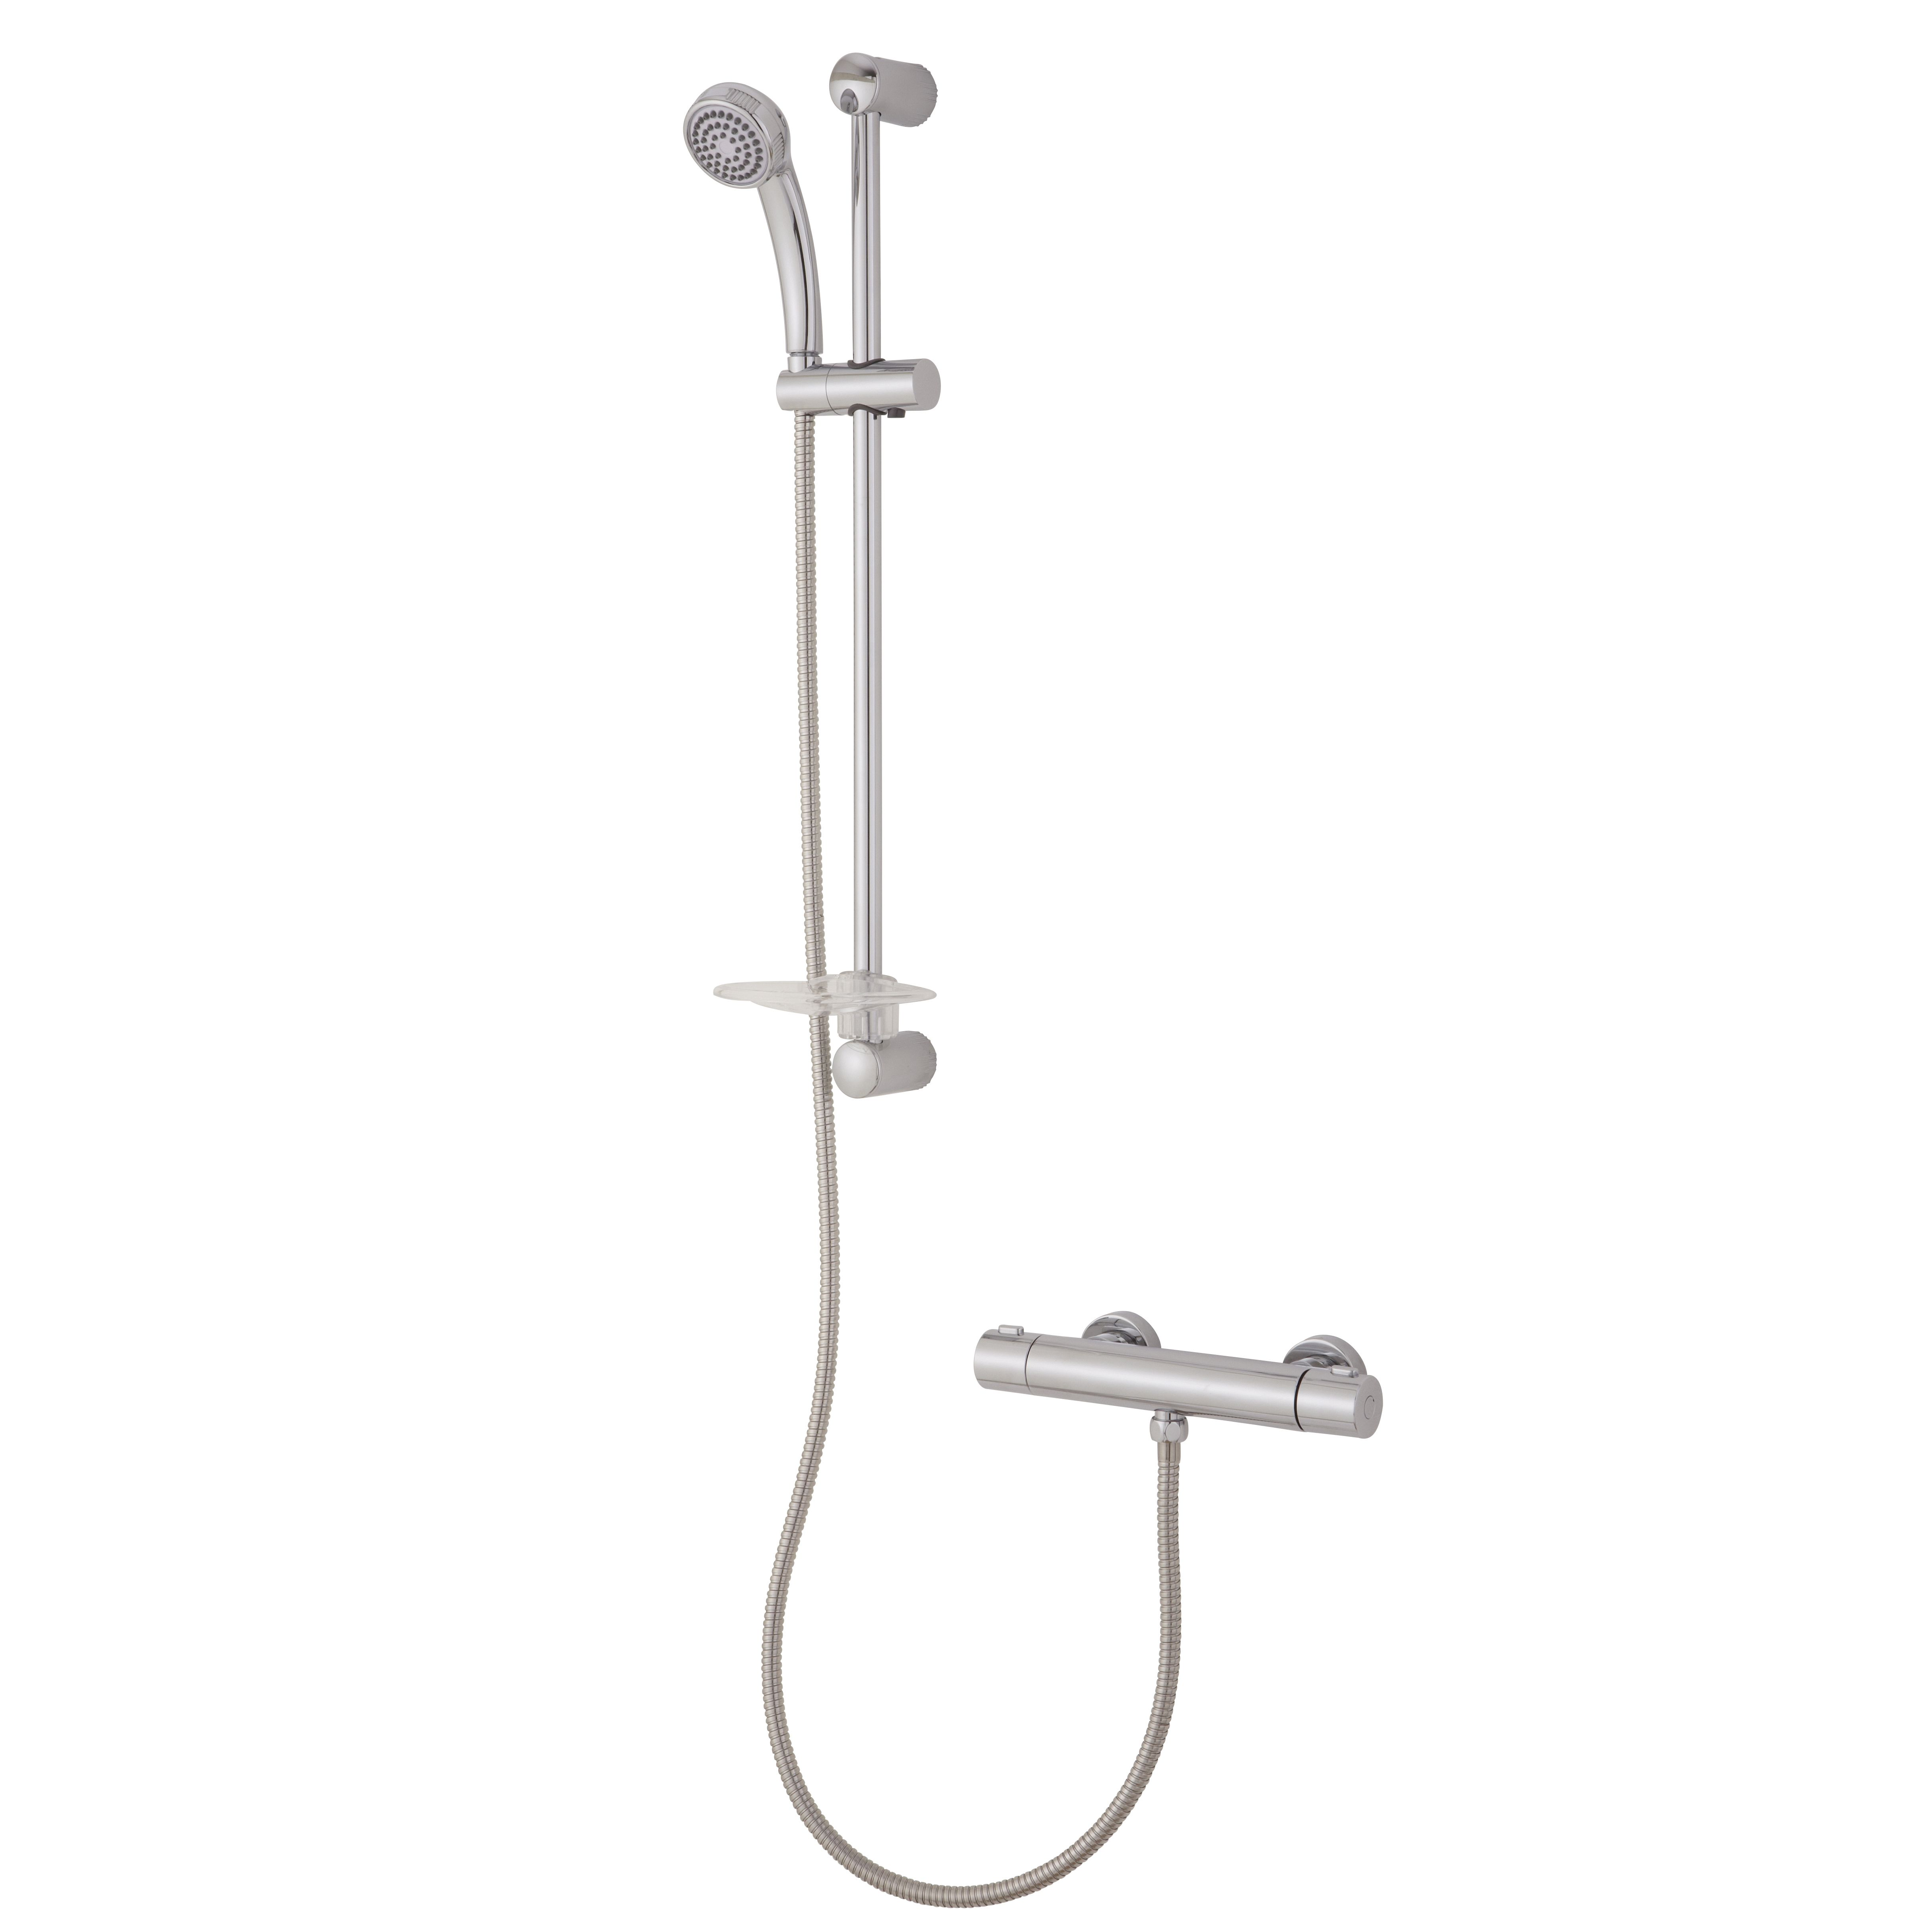 with langer complete shower and mounted pct kit fixed model valve diverter upt bar hand en shop thermostatic slide b head faucet